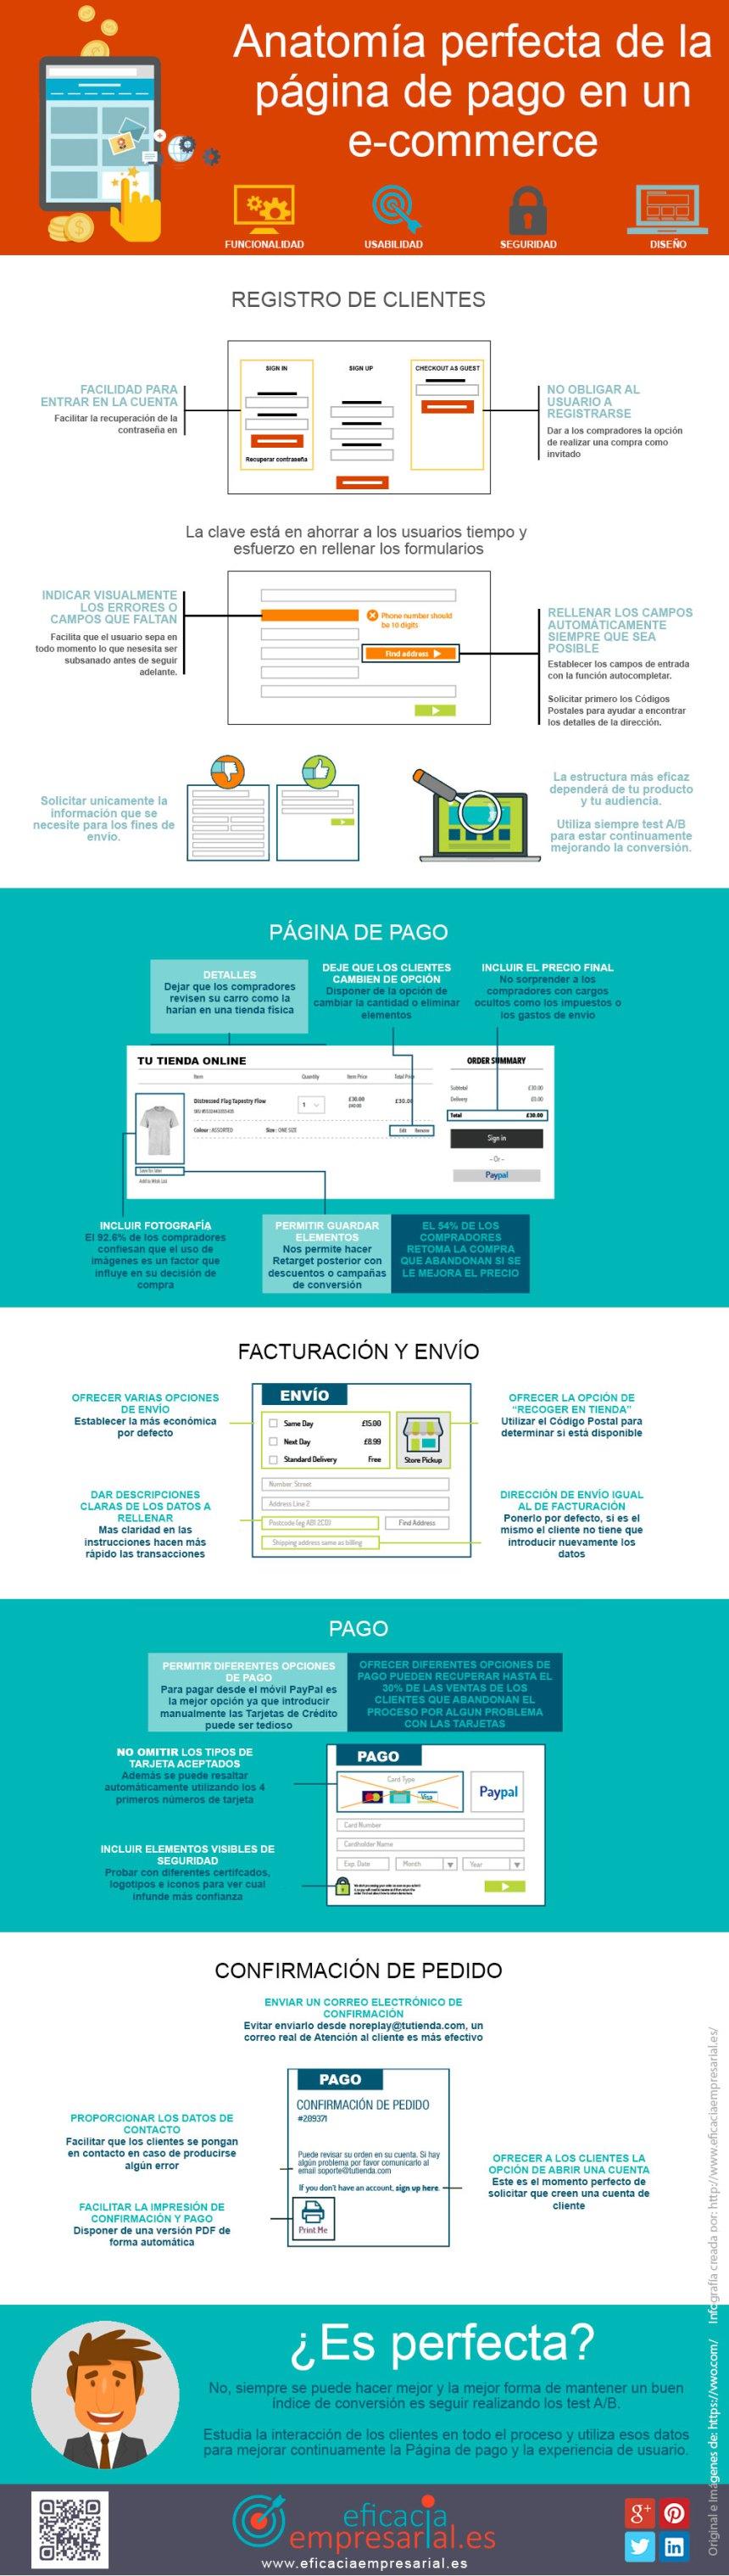 Anatomía perfecta de la página de pago en un e-commerce #infografia ...